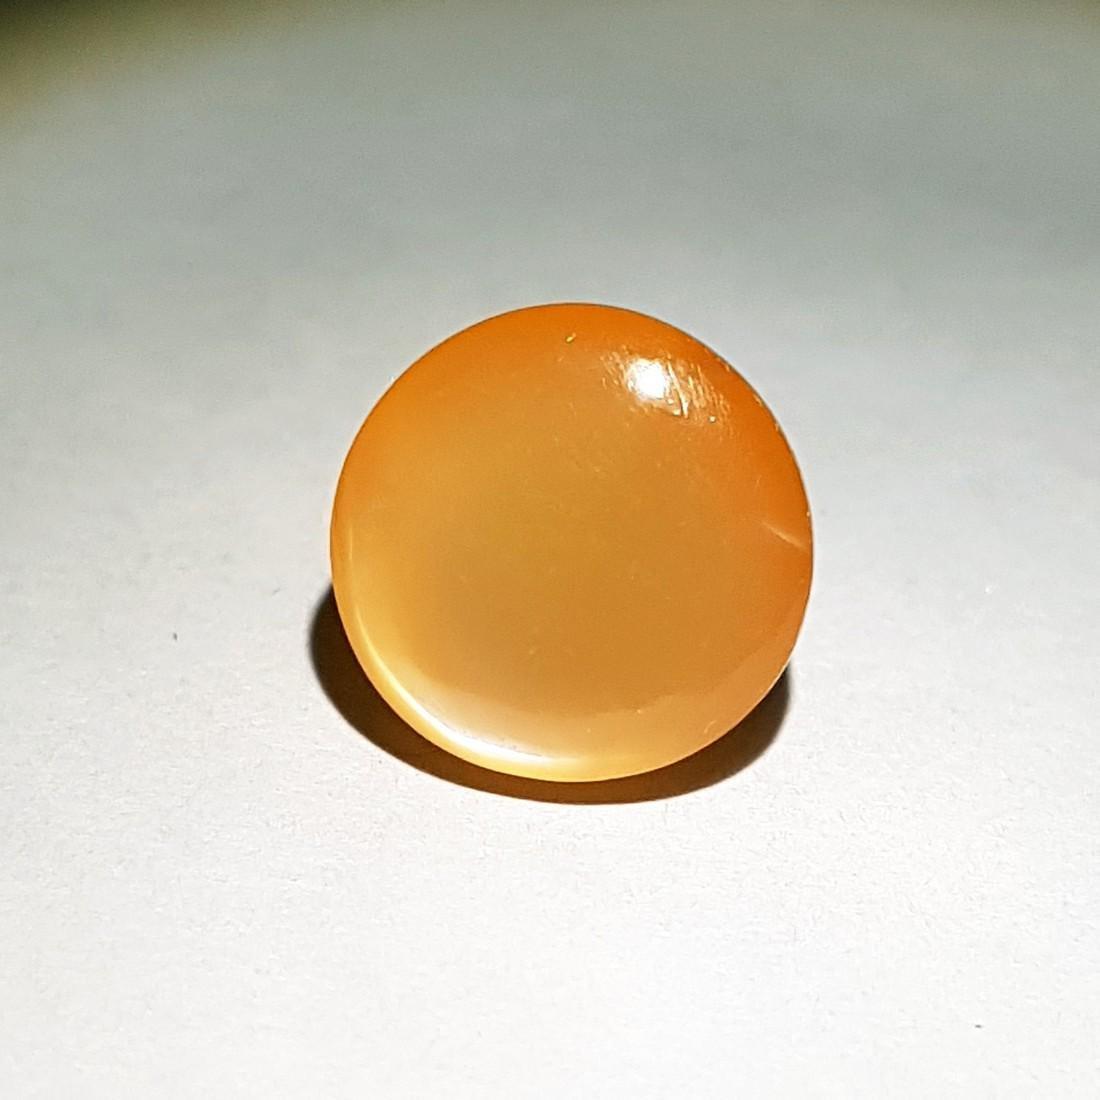 Orange Candy Moonstone Cat's Eye - 16.00 ct - 3